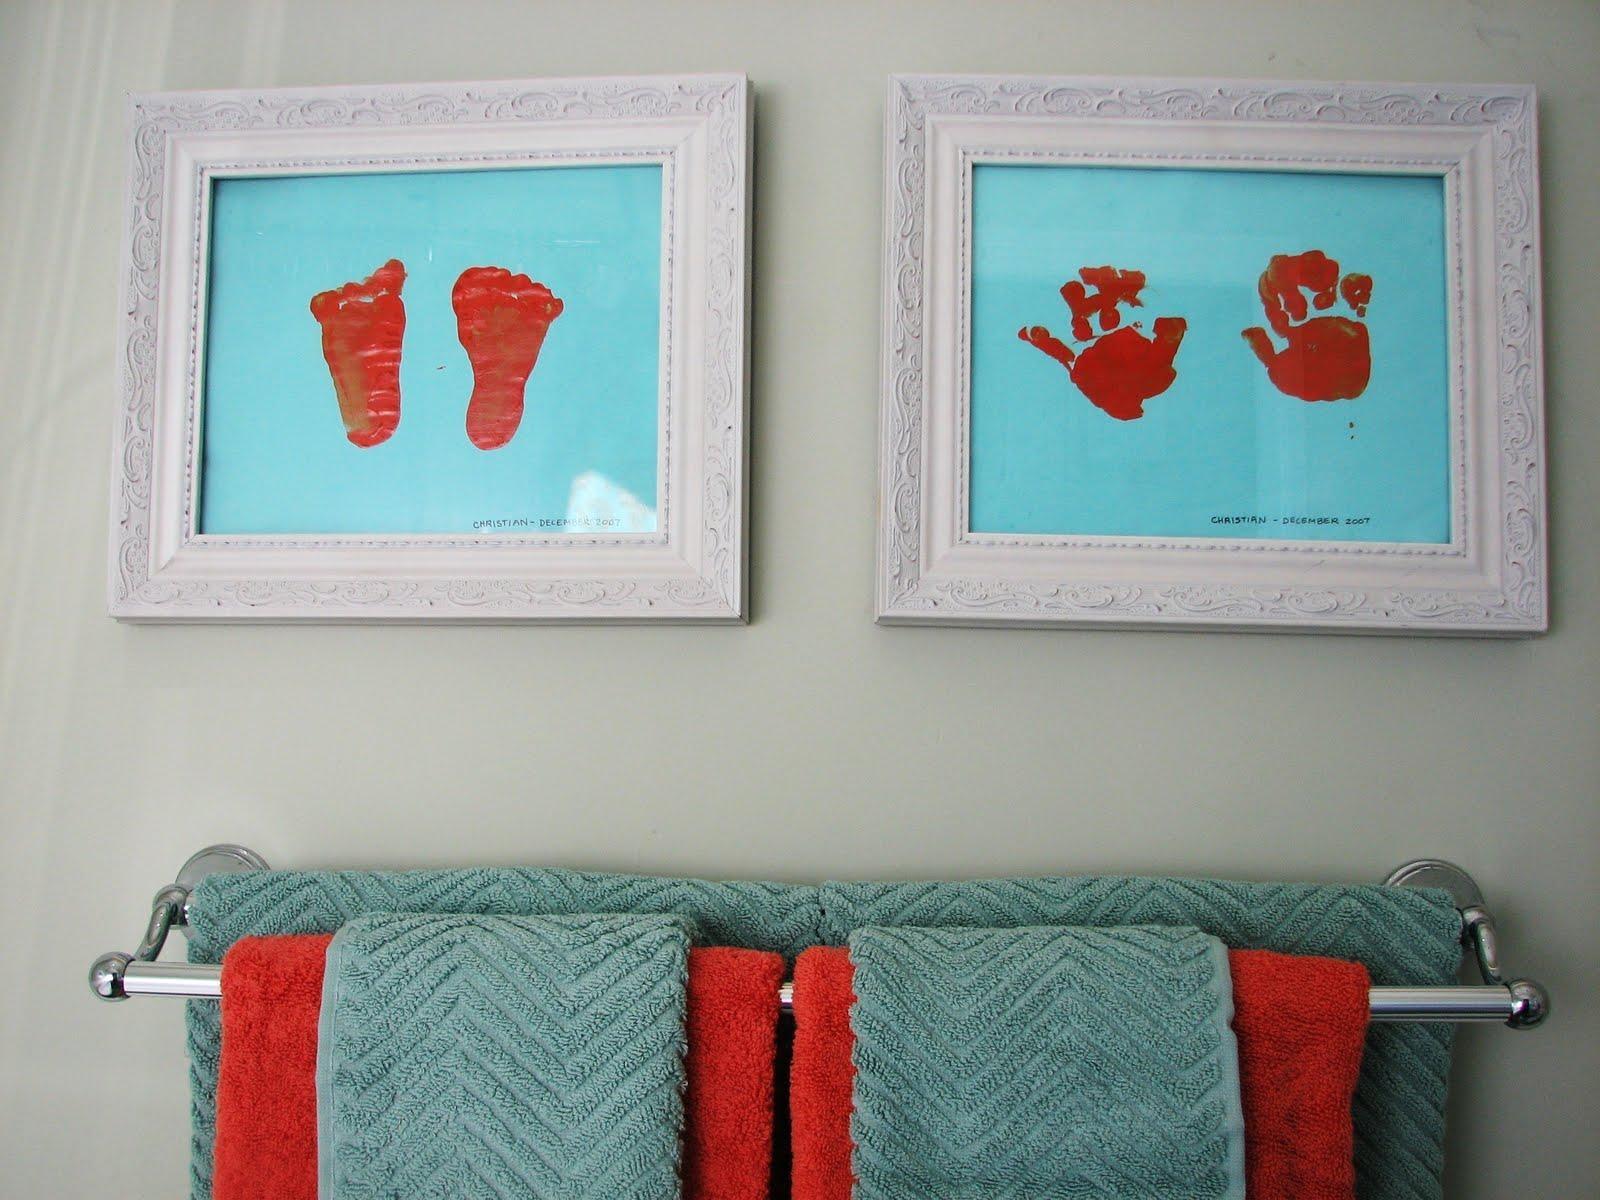 Bathroom Kids Bathroom Wall Art Ideas Kids Bathroom Ideas With For Kids Bathroom Wall Art (Image 3 of 20)